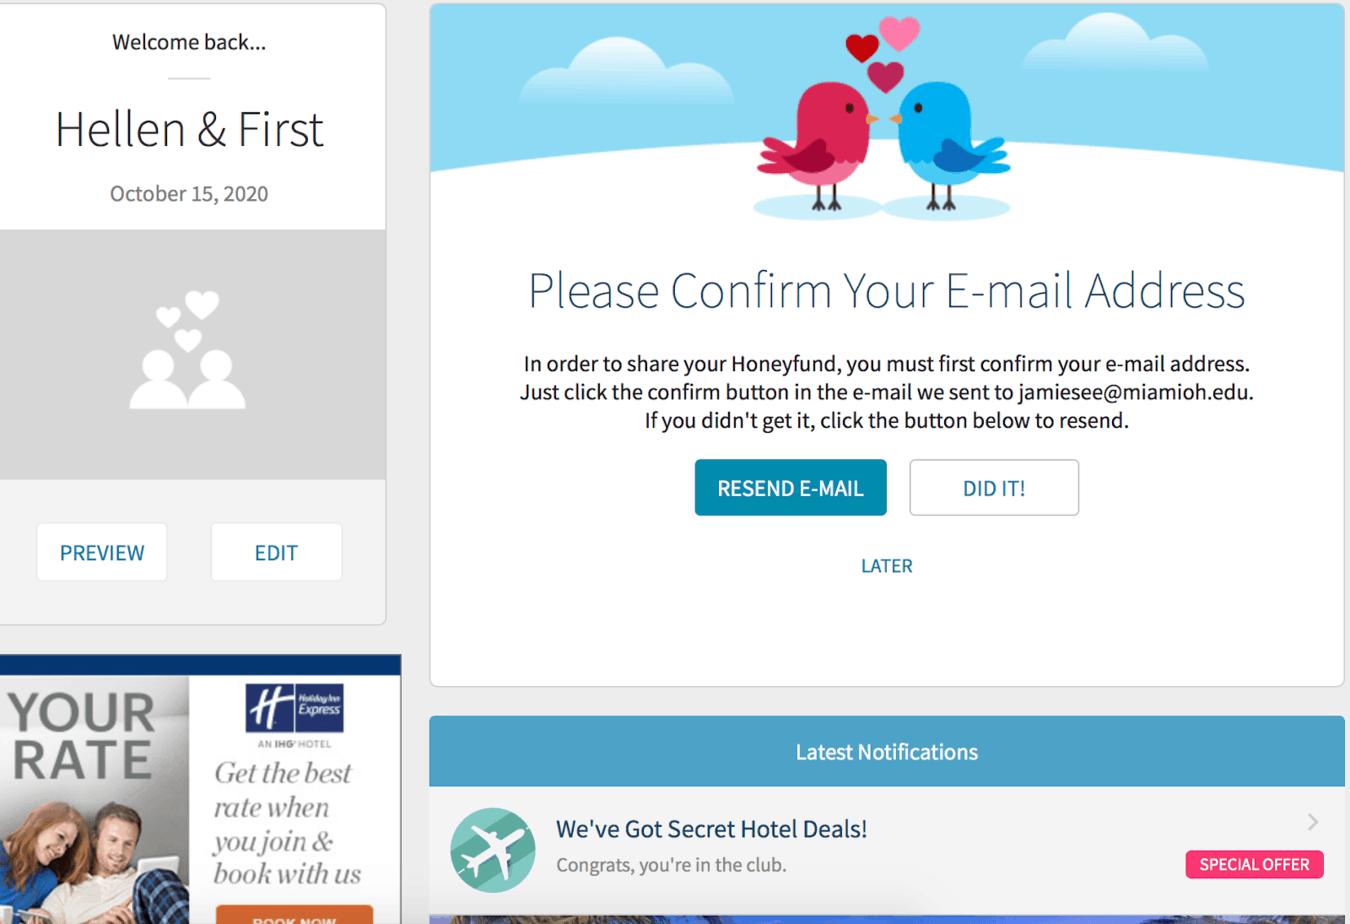 confirm email address for honeyfund